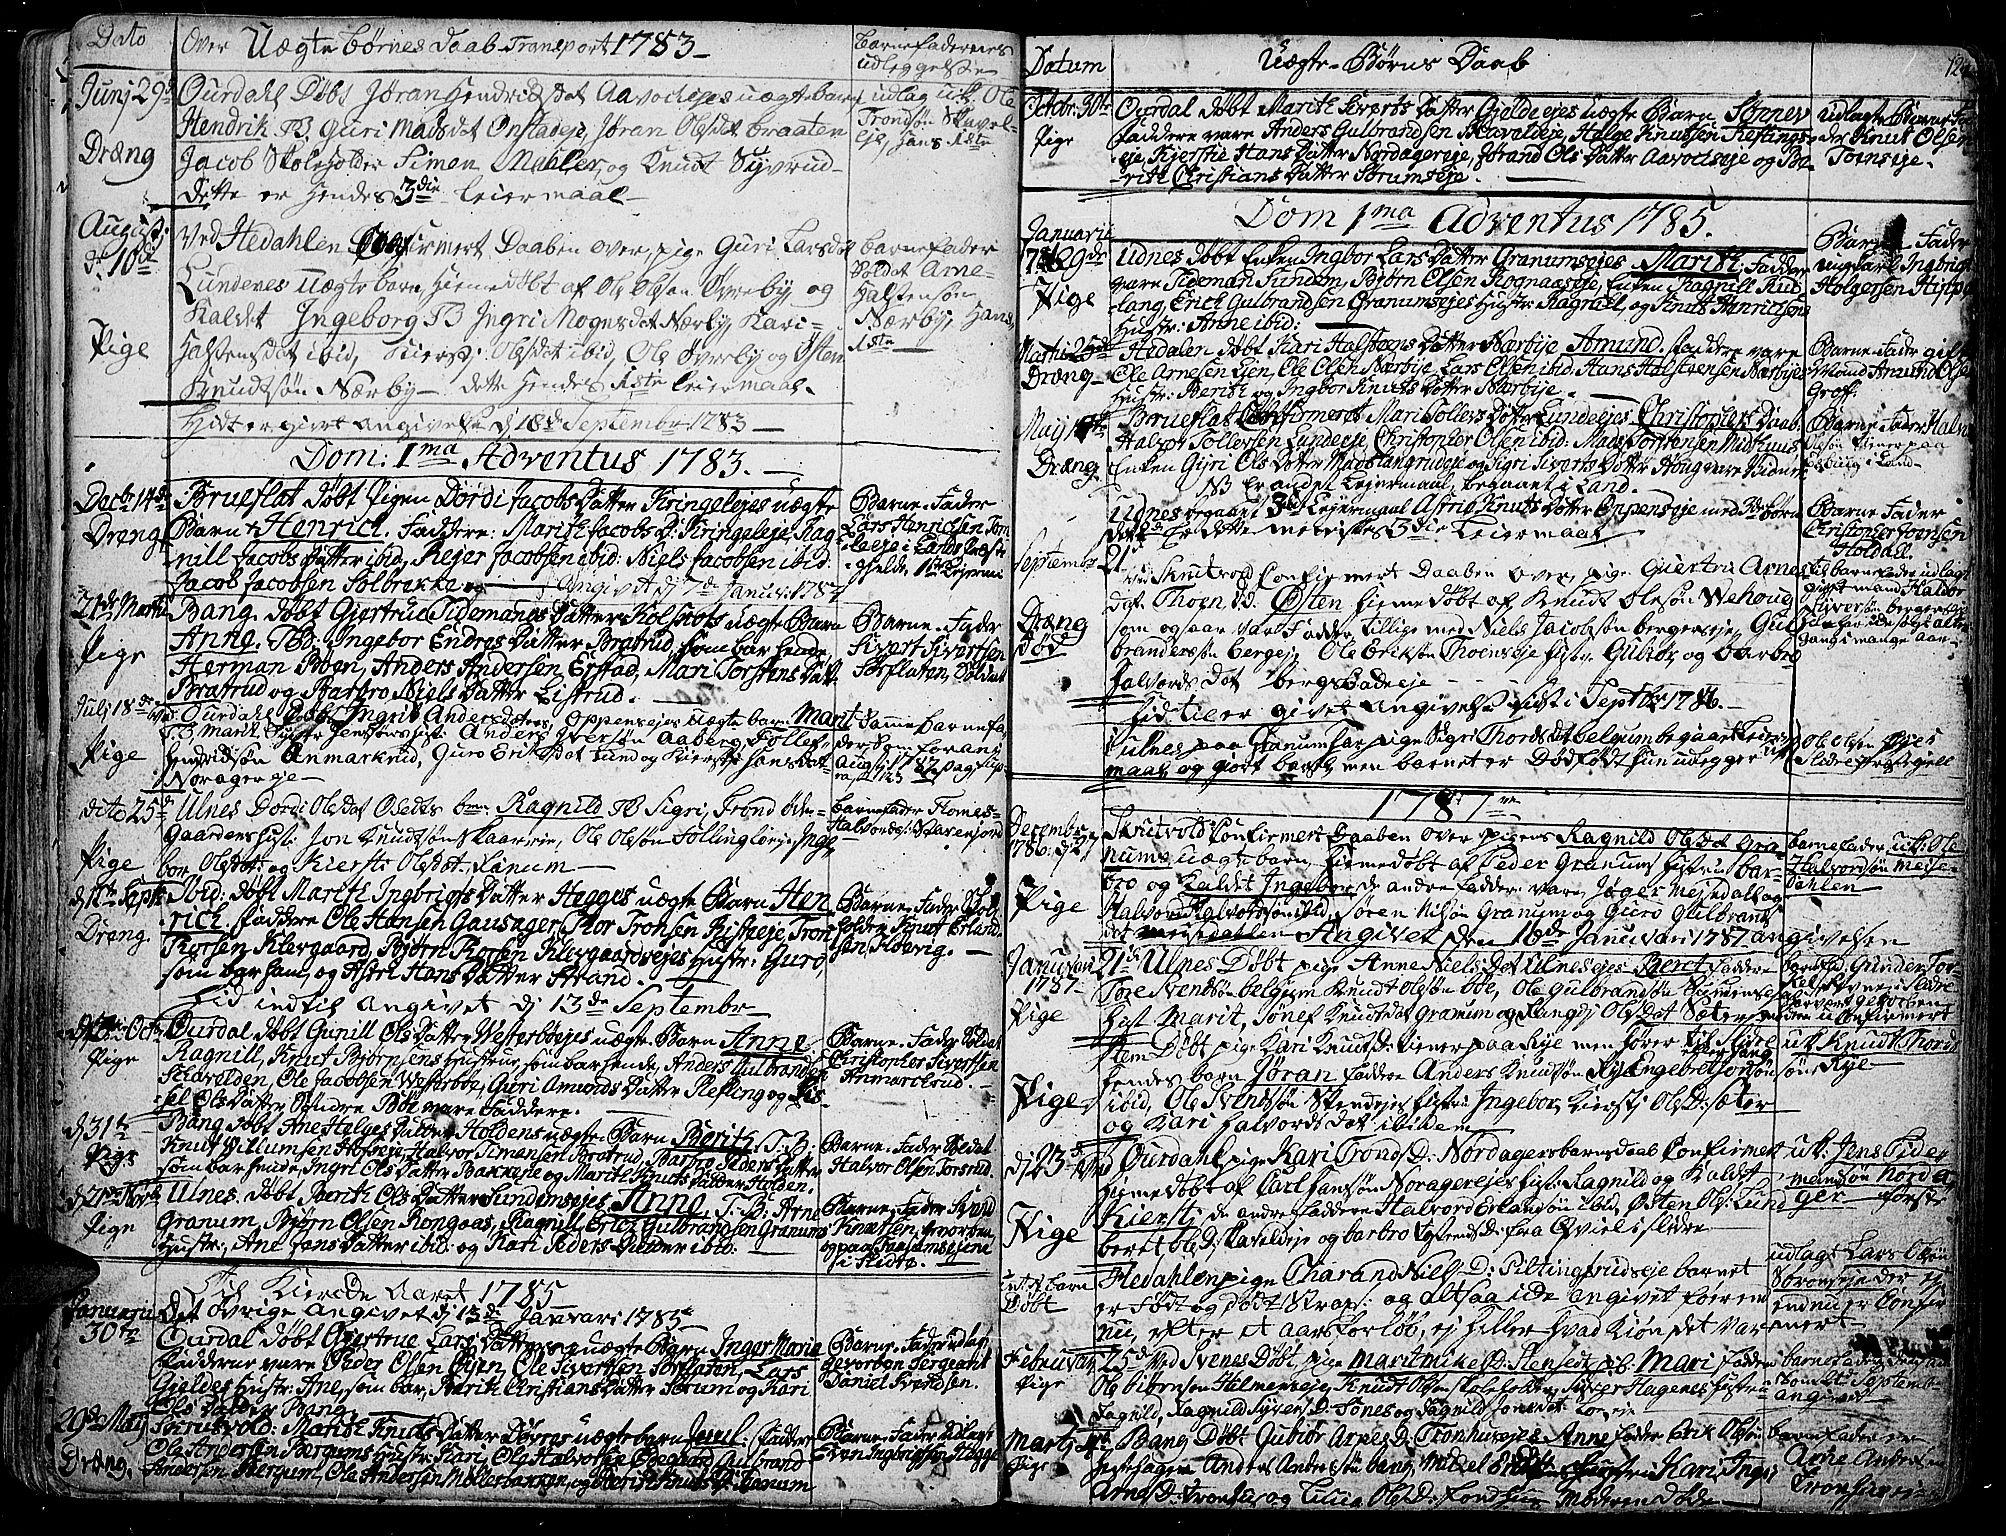 SAH, Aurdal prestekontor, Ministerialbok nr. 6, 1781-1804, s. 124